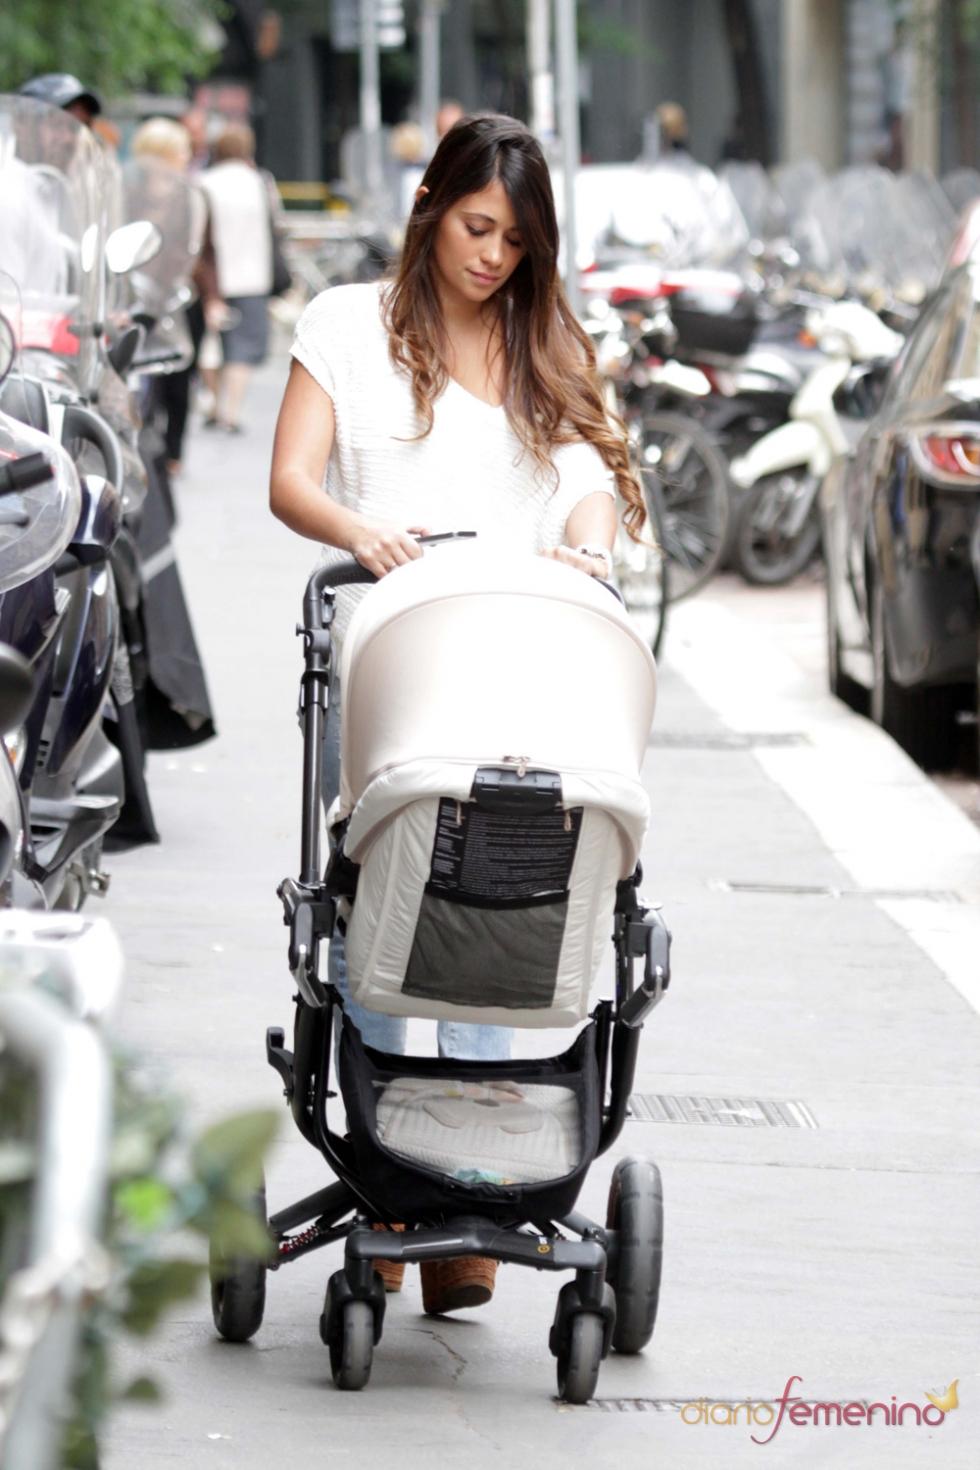 Antonella Roccuzzo disfruta paseando con Thiago, su hijo con Leo Messi